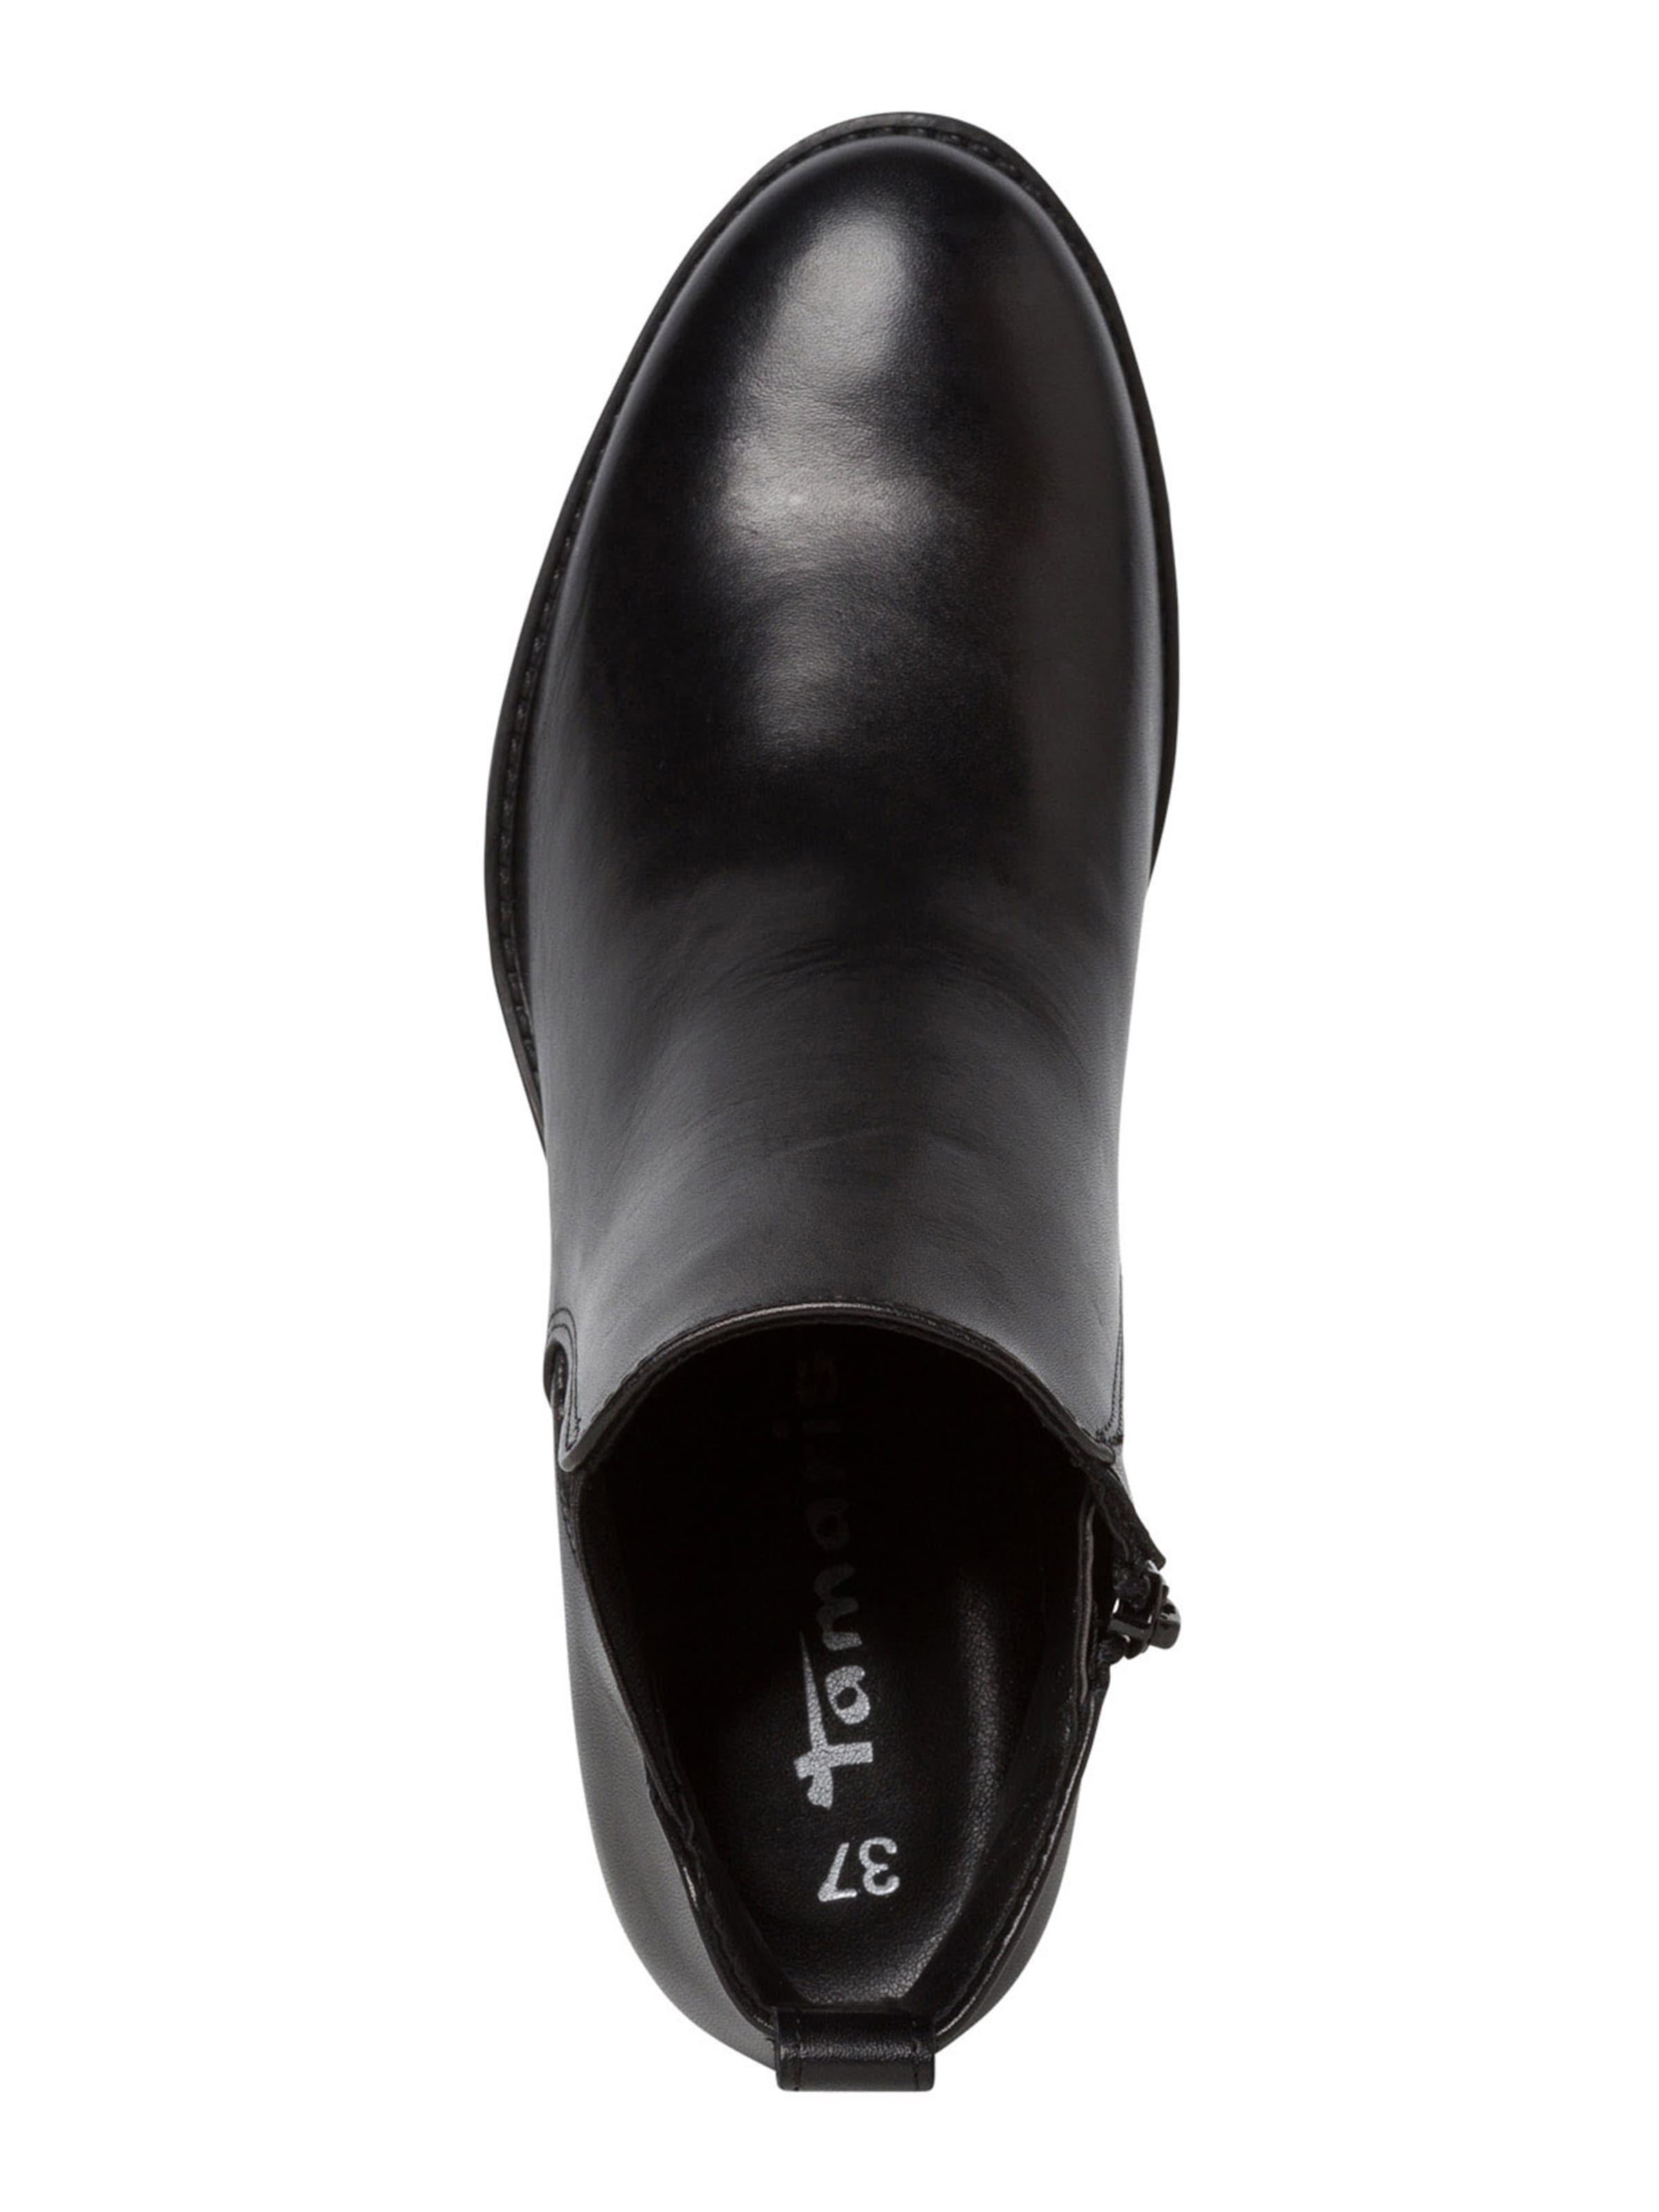 TAMARIS Chelsea boots i svart